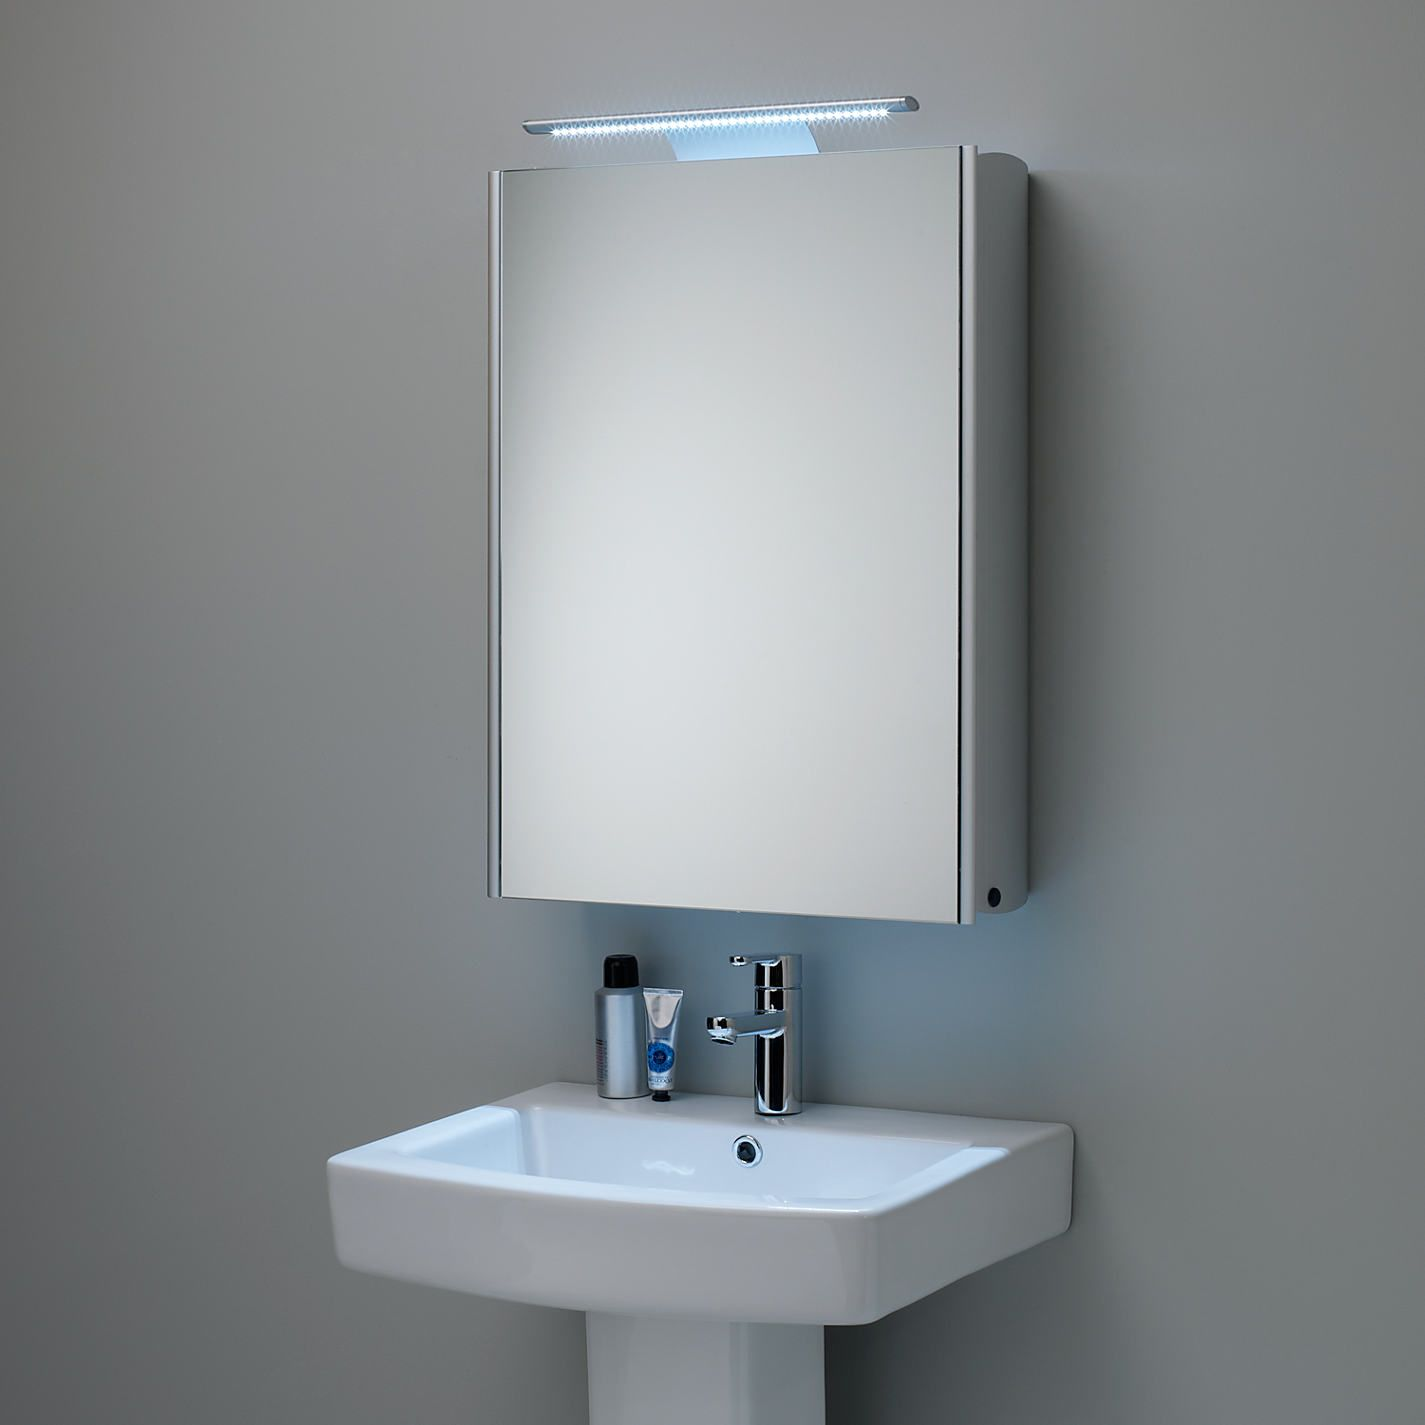 Roper Rhodes Equinox Illuminated Single Mirrored Bathroom Cabinet With Double Sided Mirror Aluminium